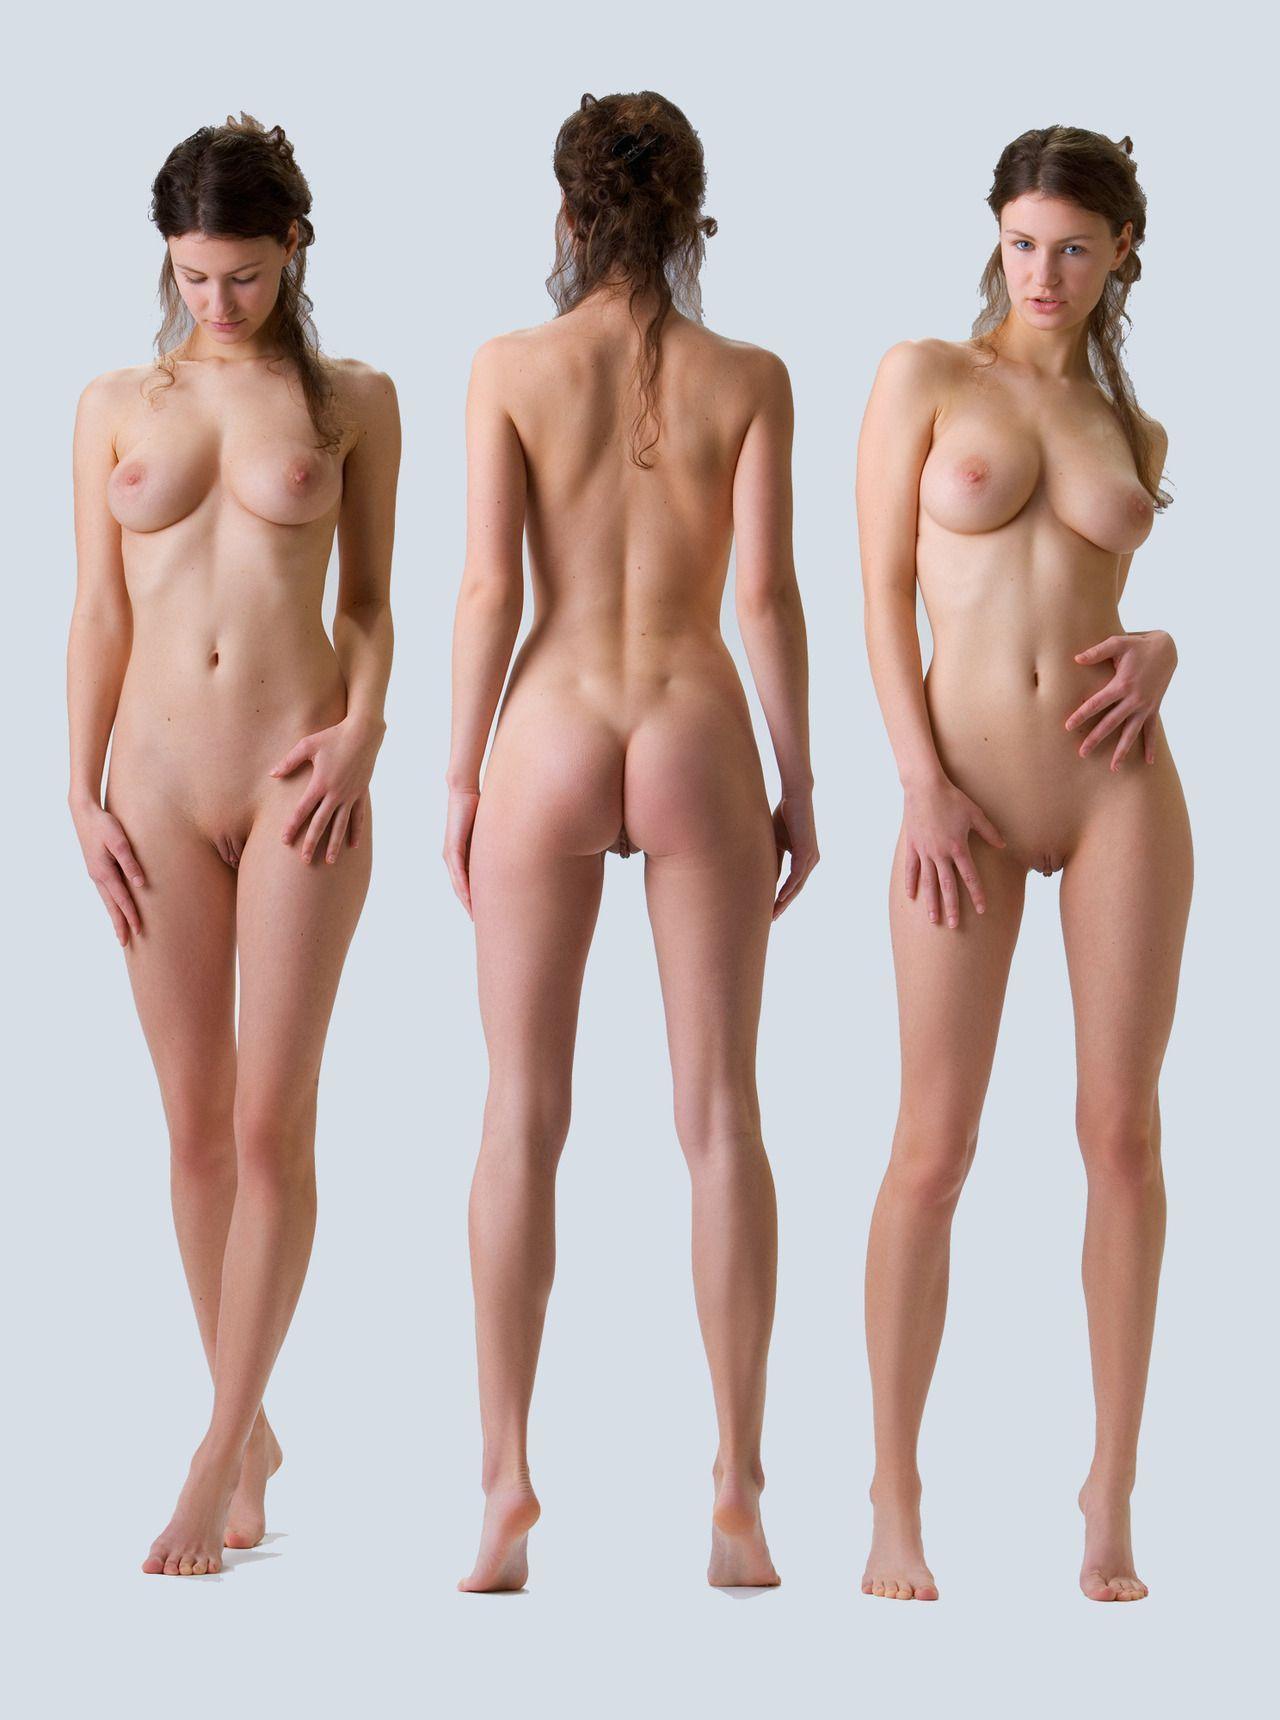 Venessa hudges completly naked